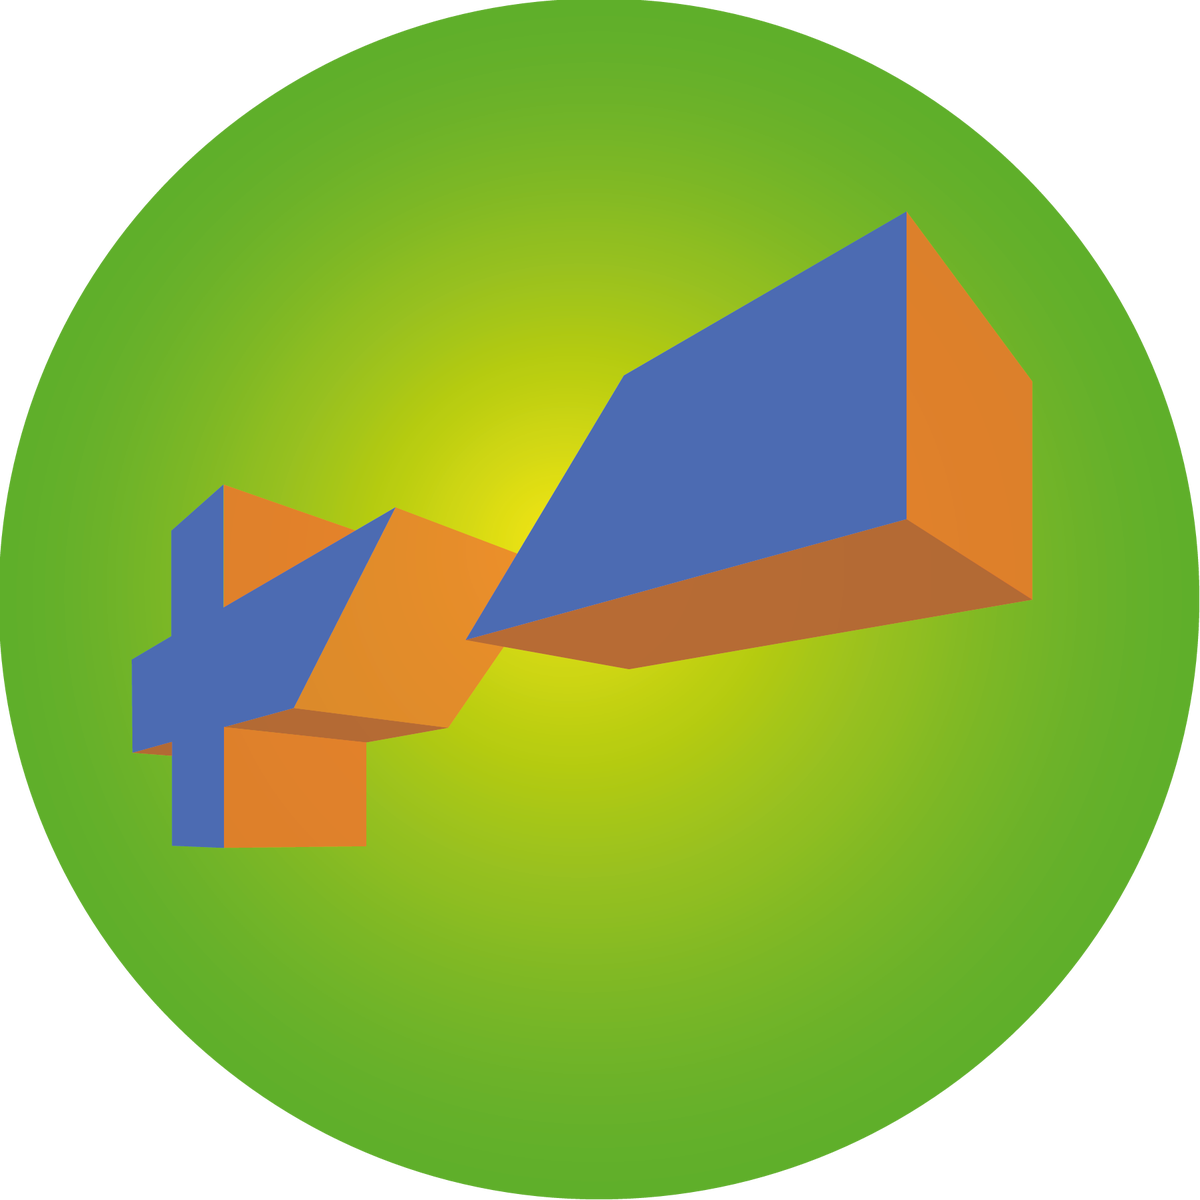 Image of 3 pcs round - green / yellow / blue / orange